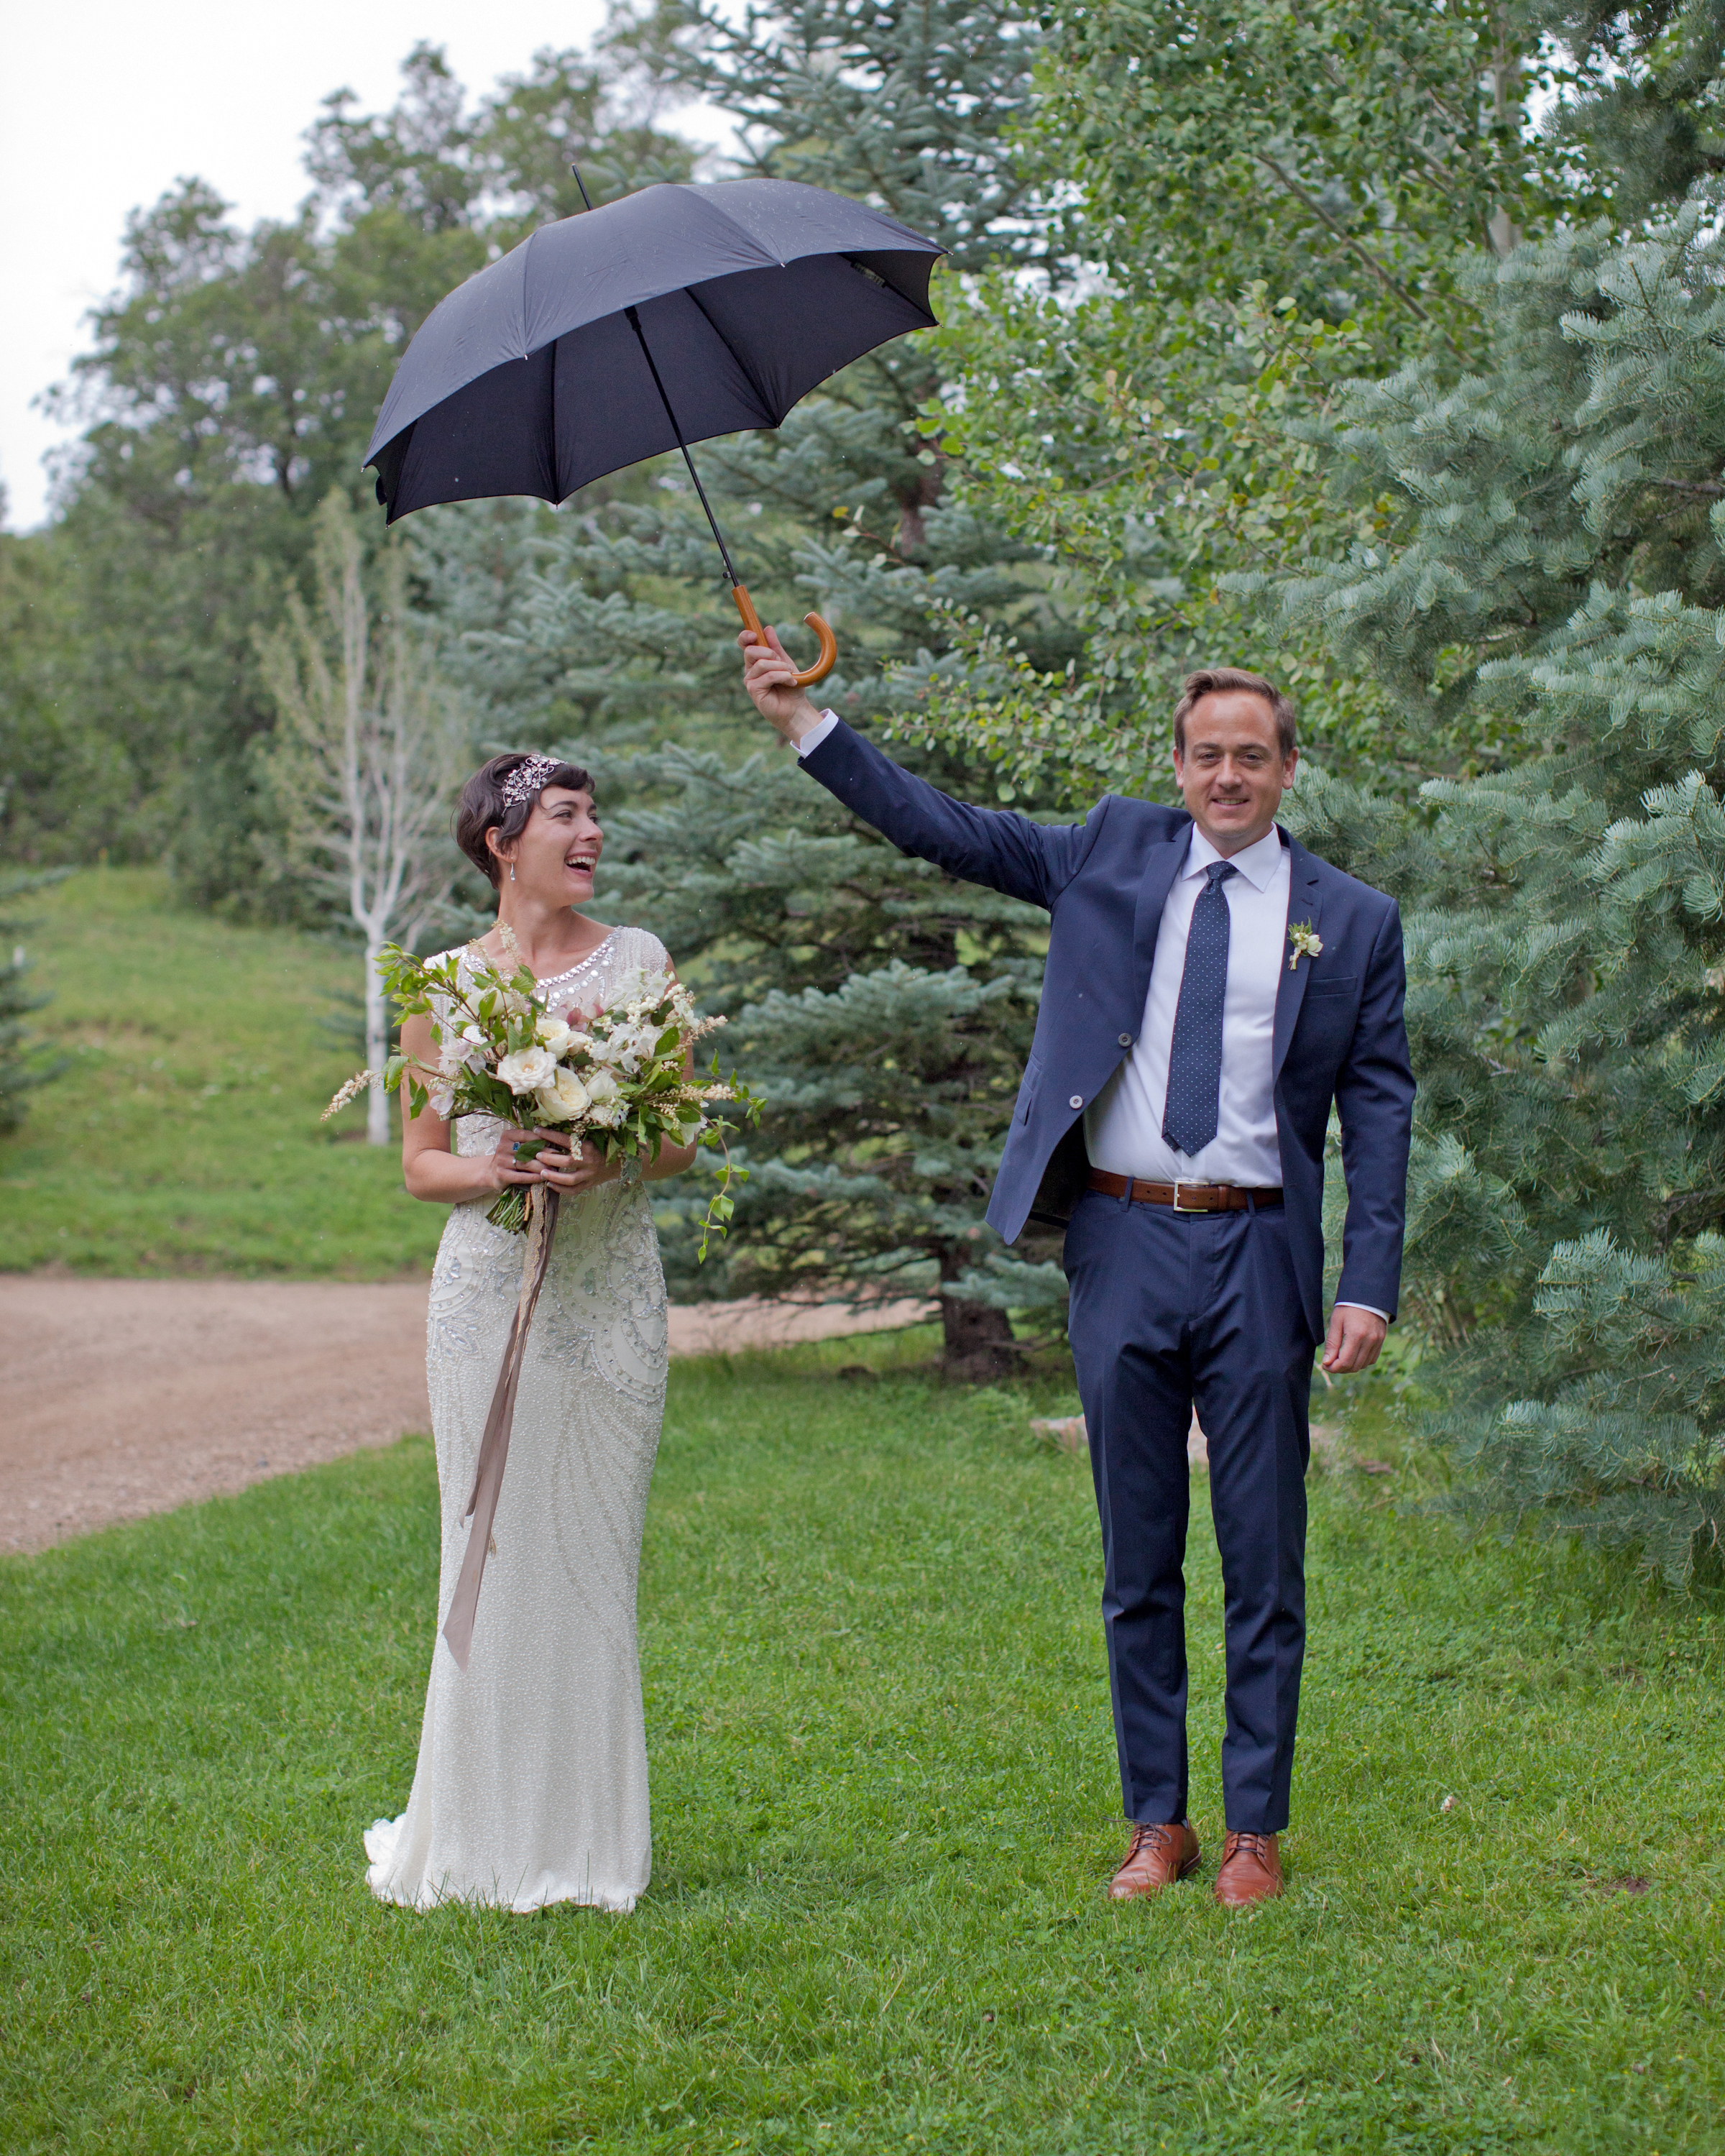 lizzy-pat-wedding-umbrella-050-s111777-0115.jpg